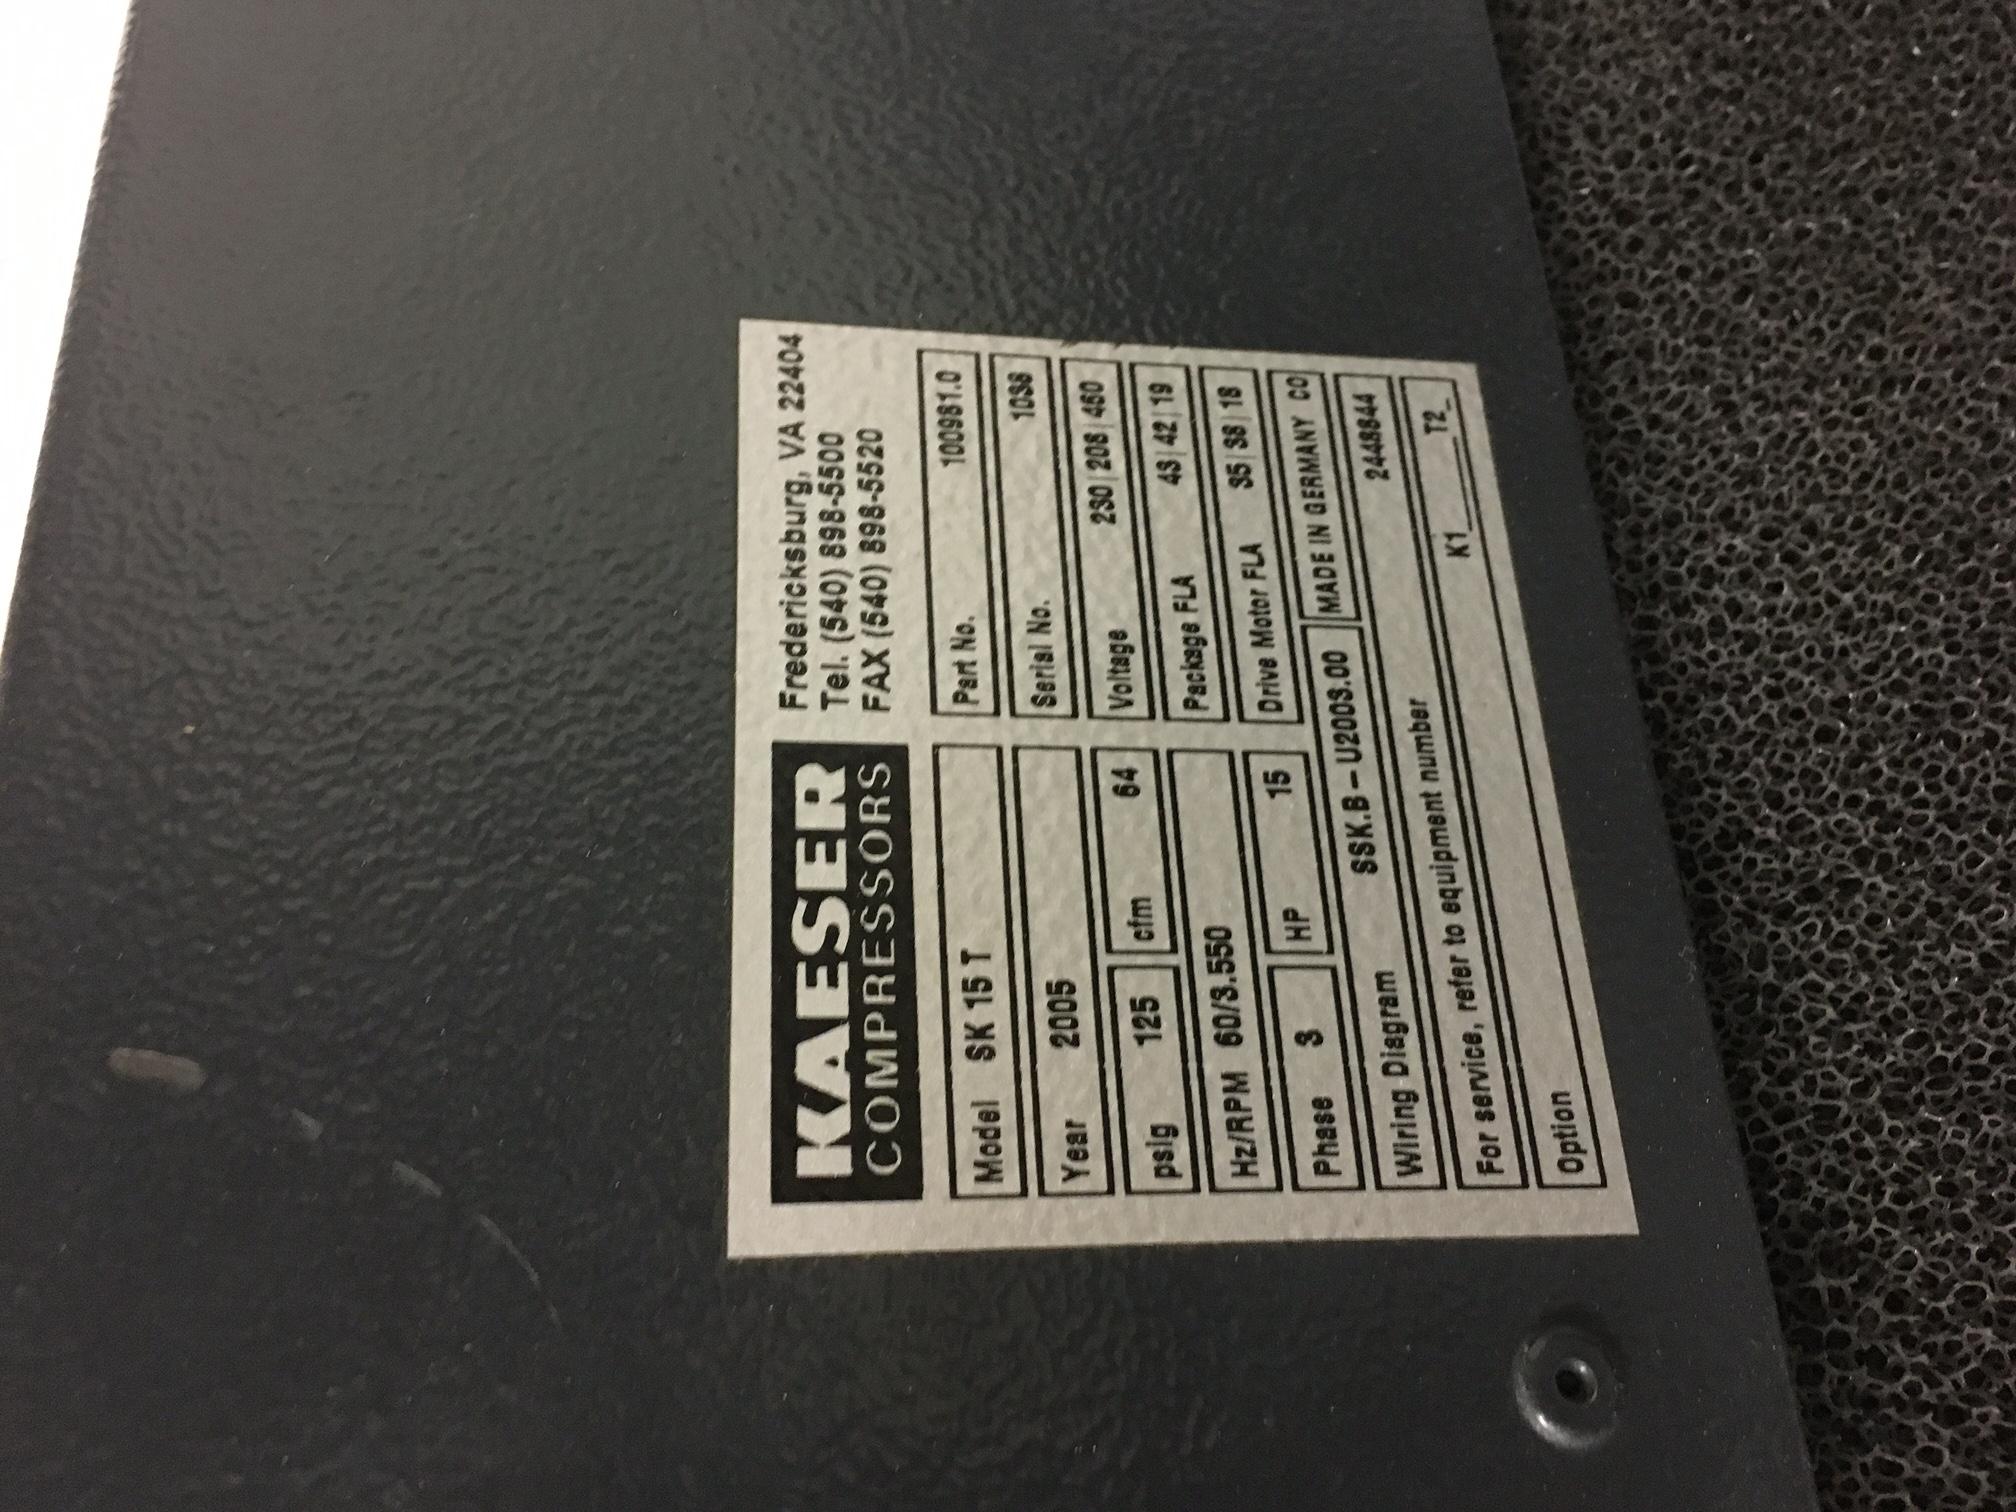 hight resolution of kaeser wiring diagrams wiring library 2005 kaeser 15 hp screw compressor kaeser 15 hp